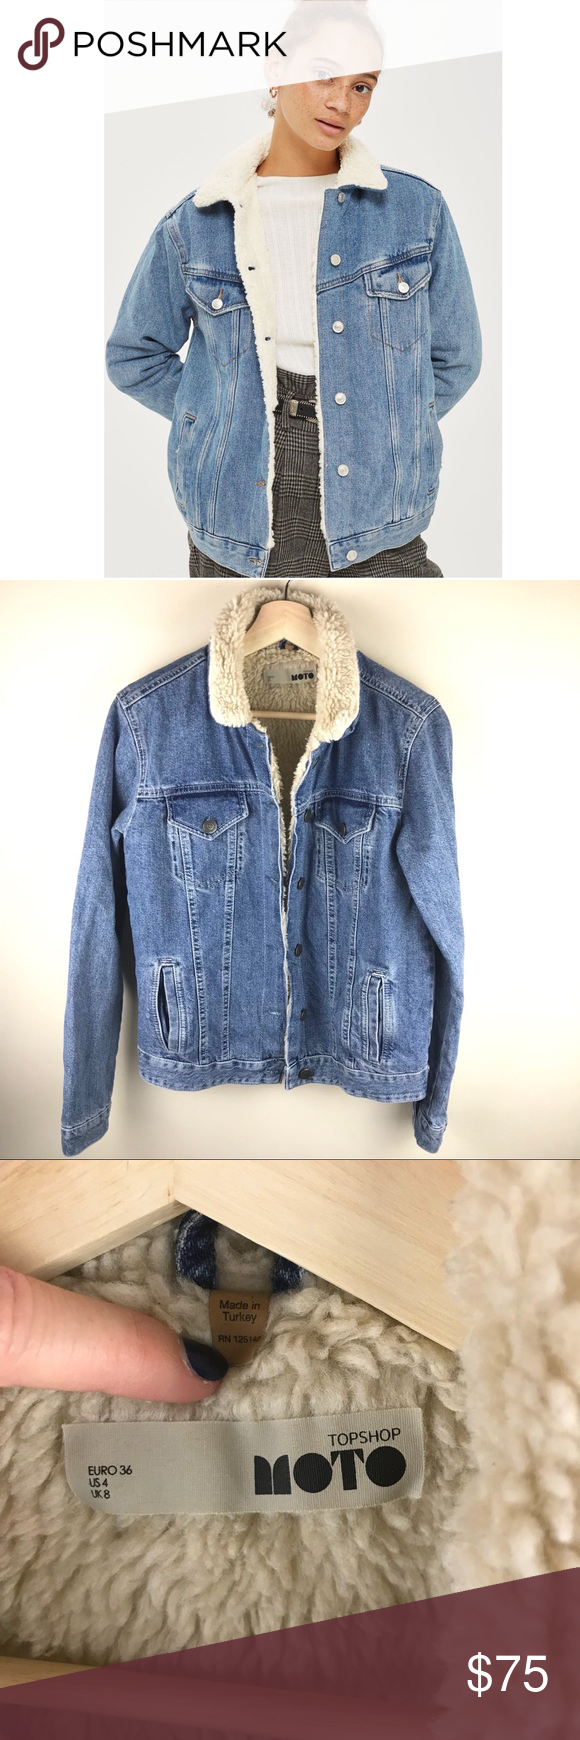 Top shop Vintage Moto Sherpa Jacket 4 Clothes